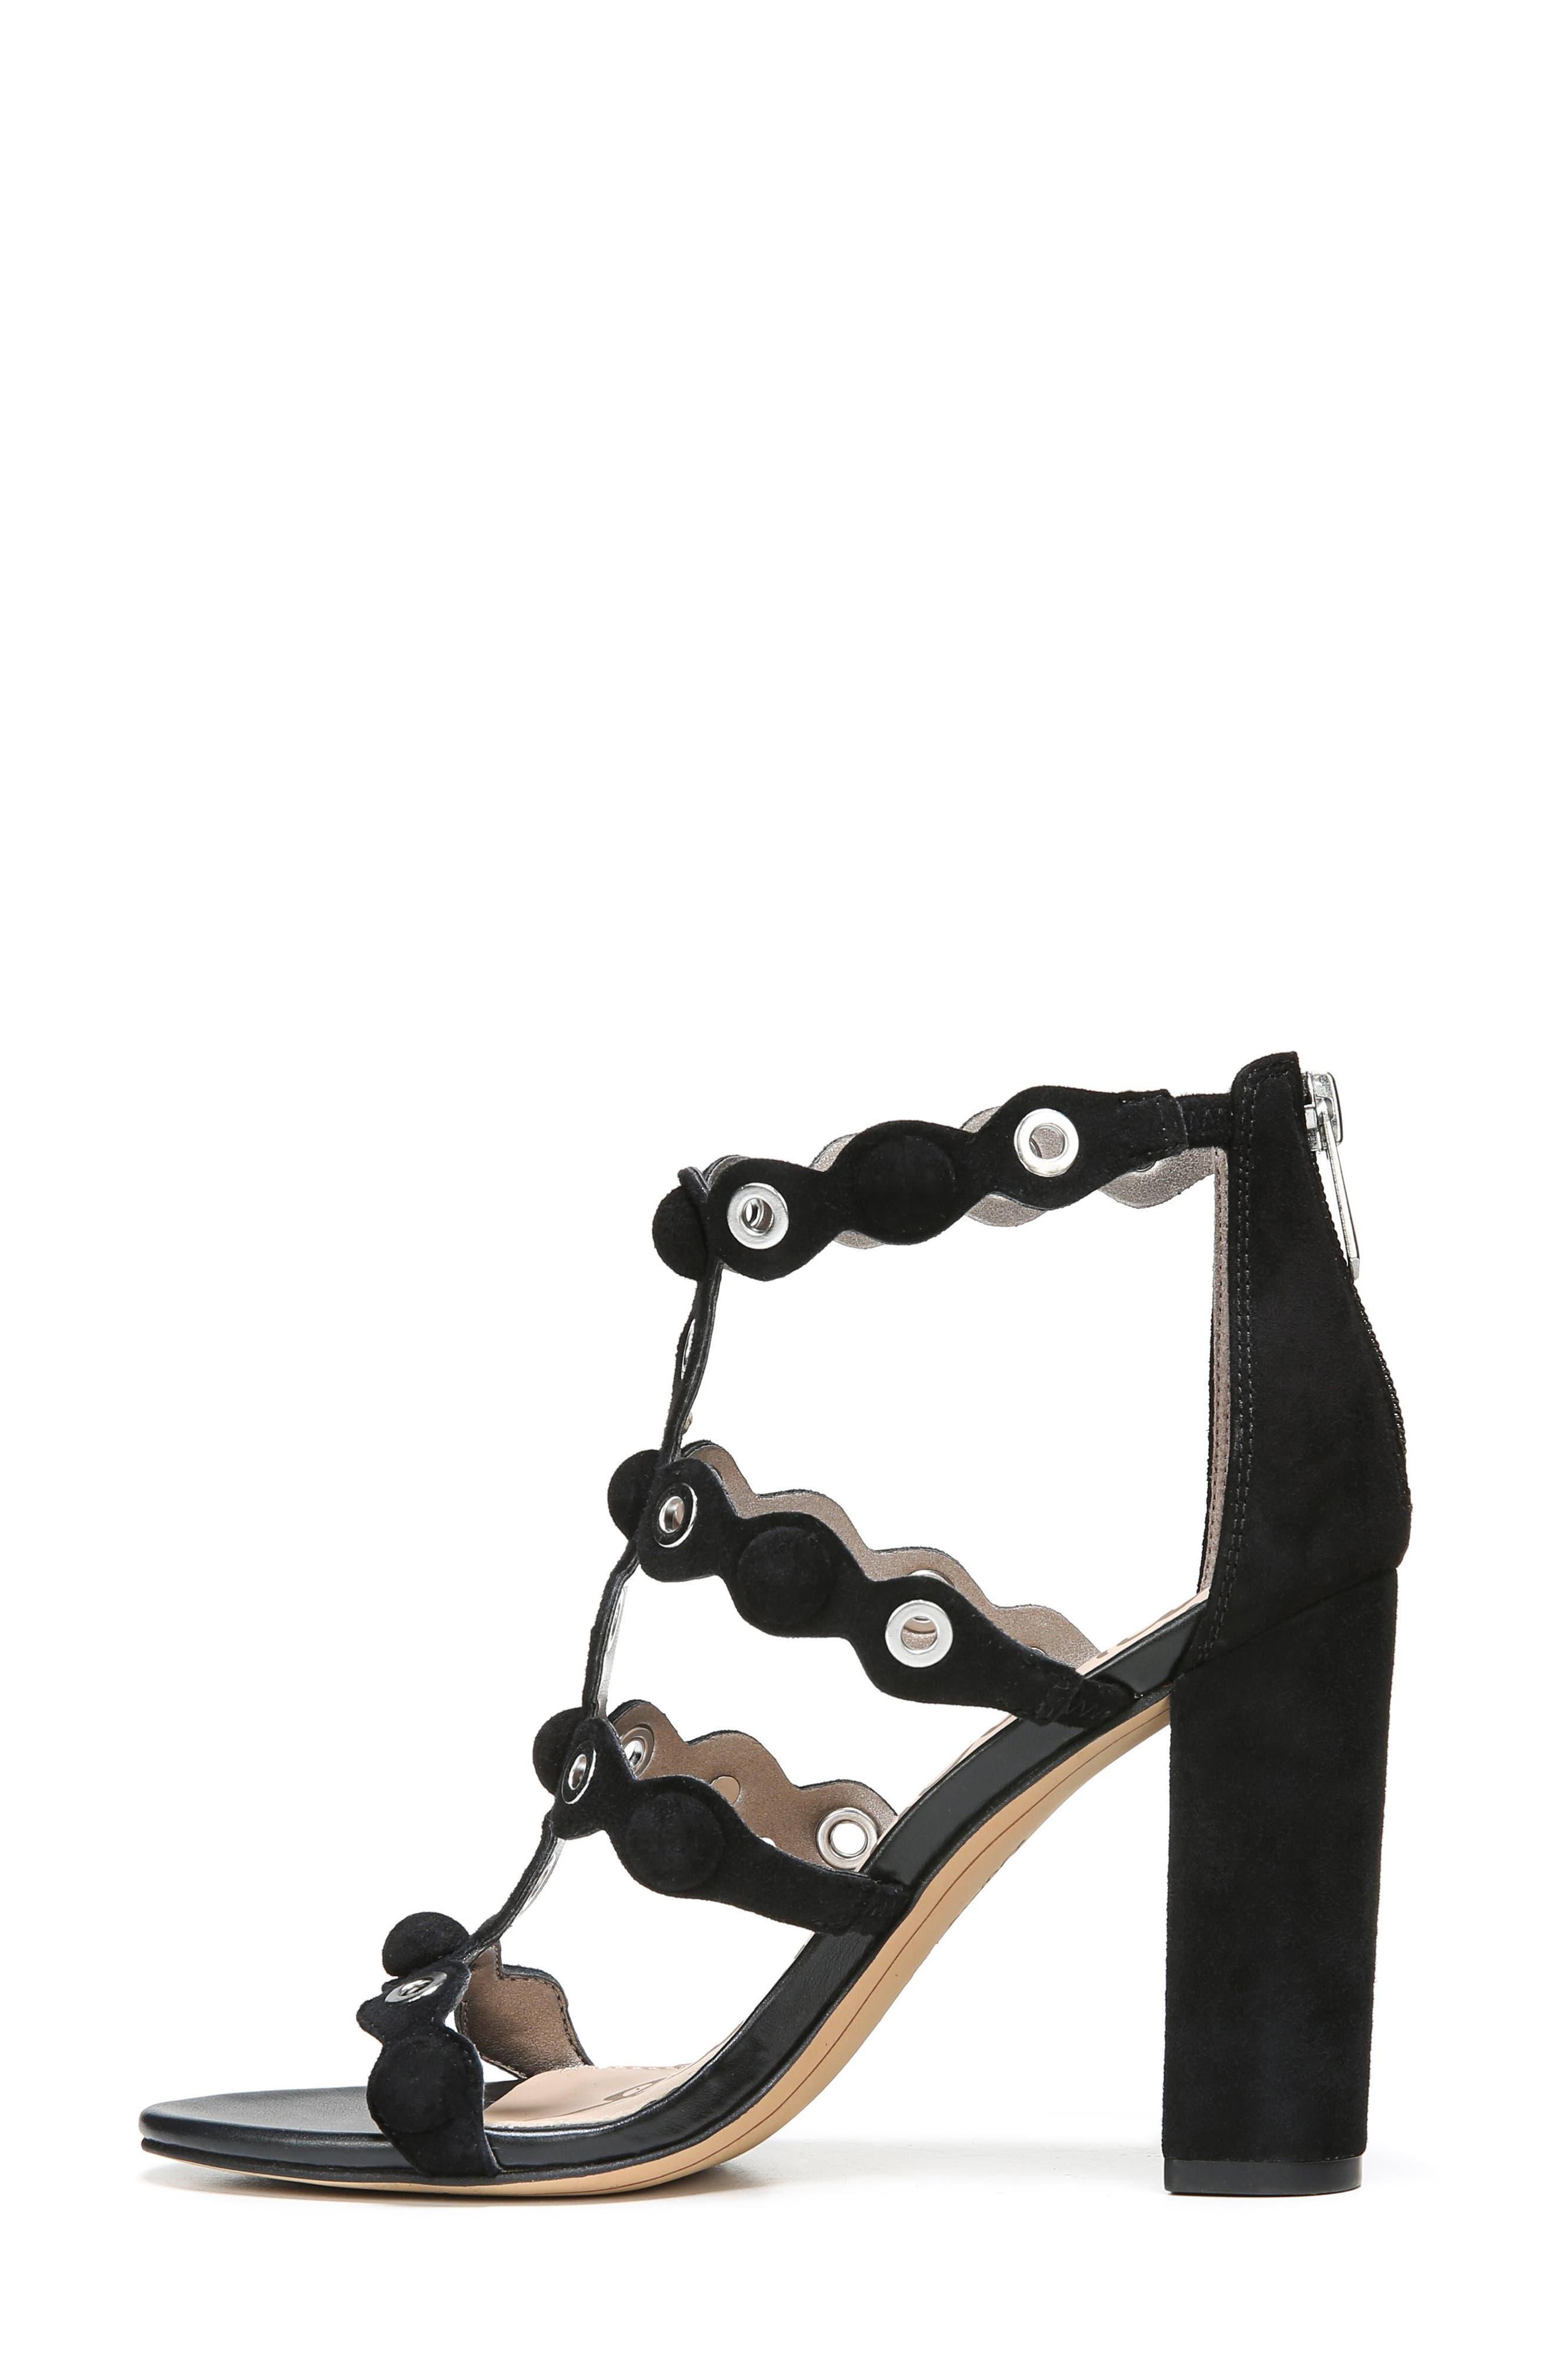 Yuli Grommet Sandal,                             Alternate thumbnail 4, color,                             Black Leather